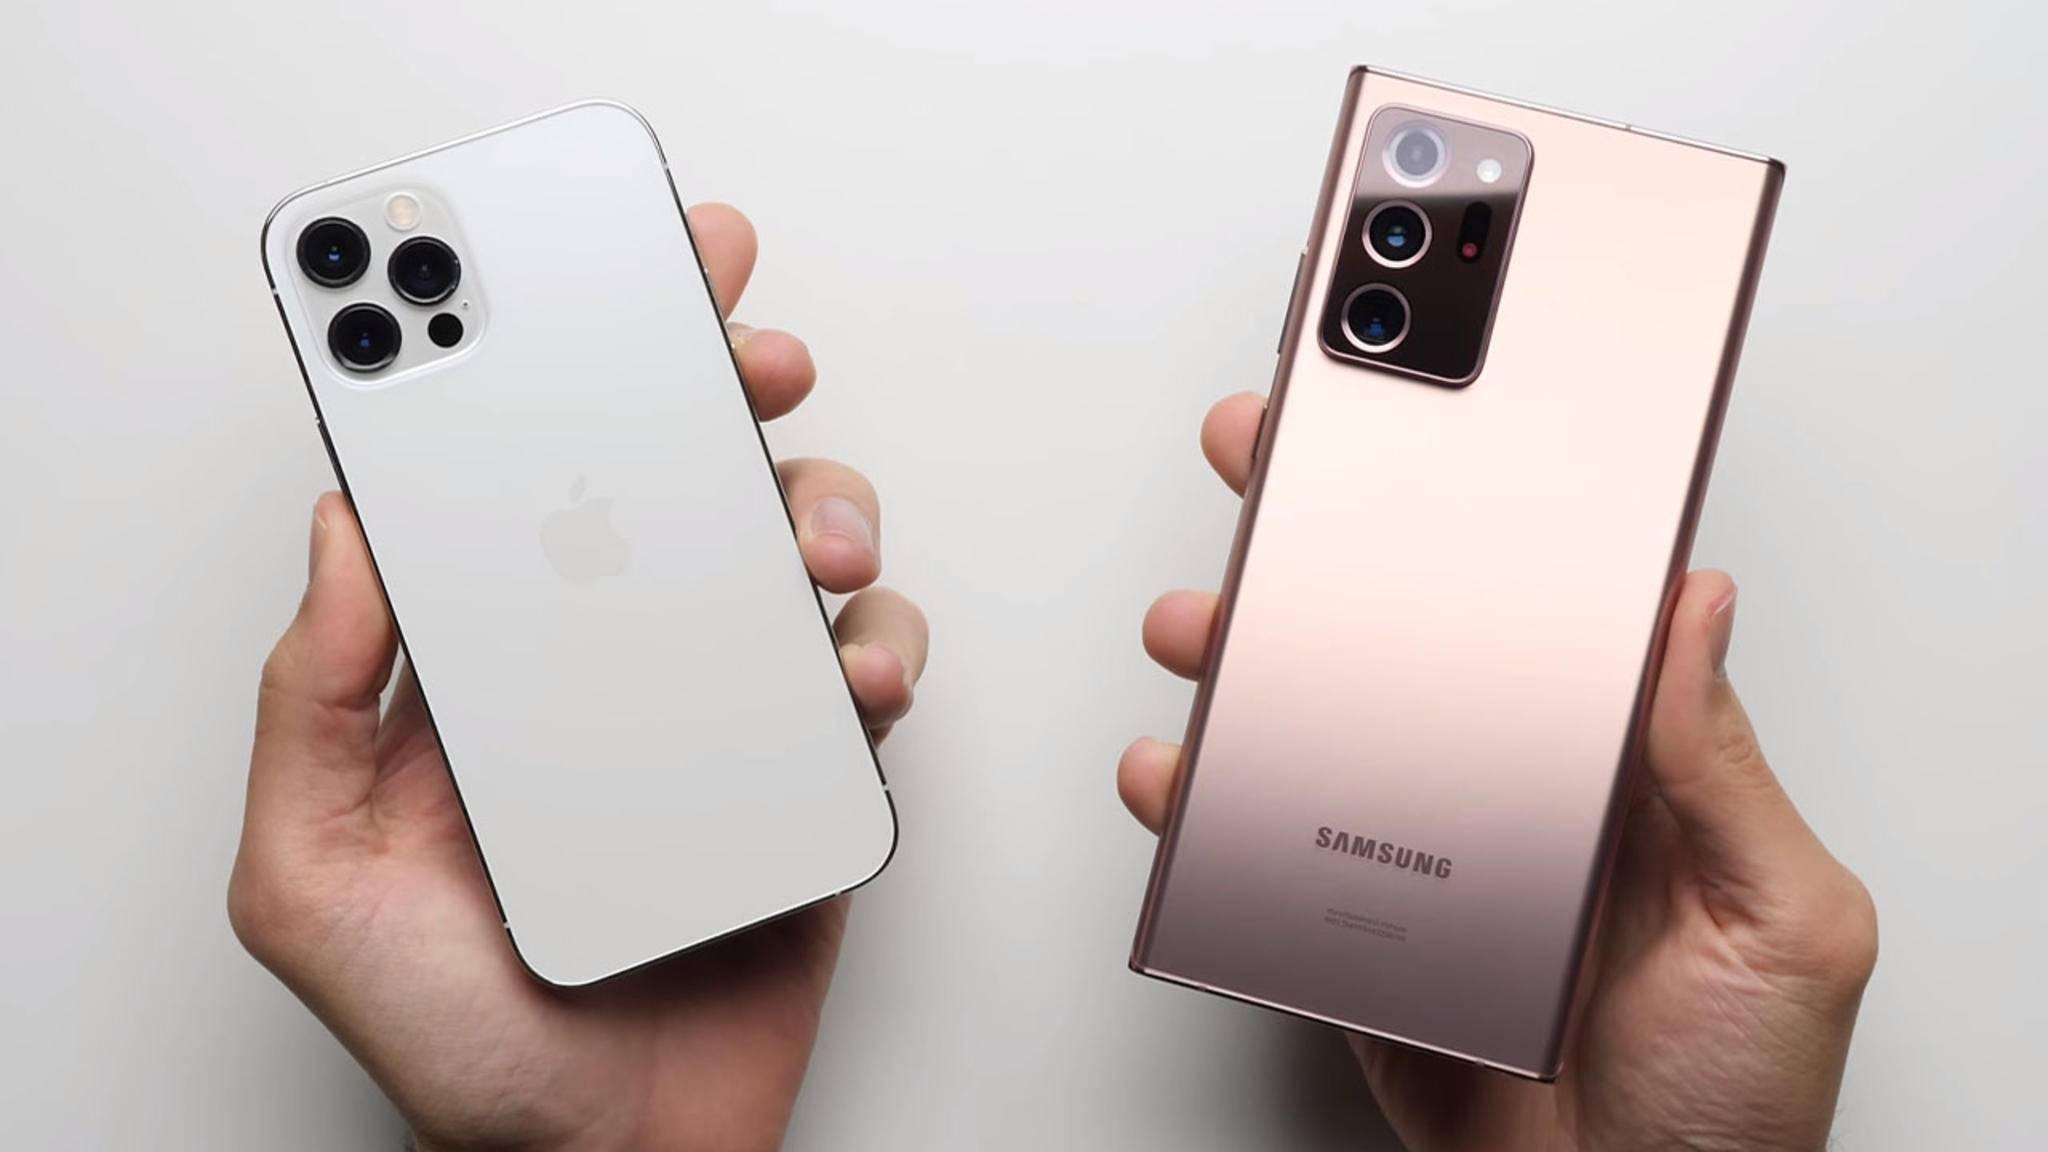 iPhone-12-pro-samsung-galaxy-note-20-ultra-speed-test